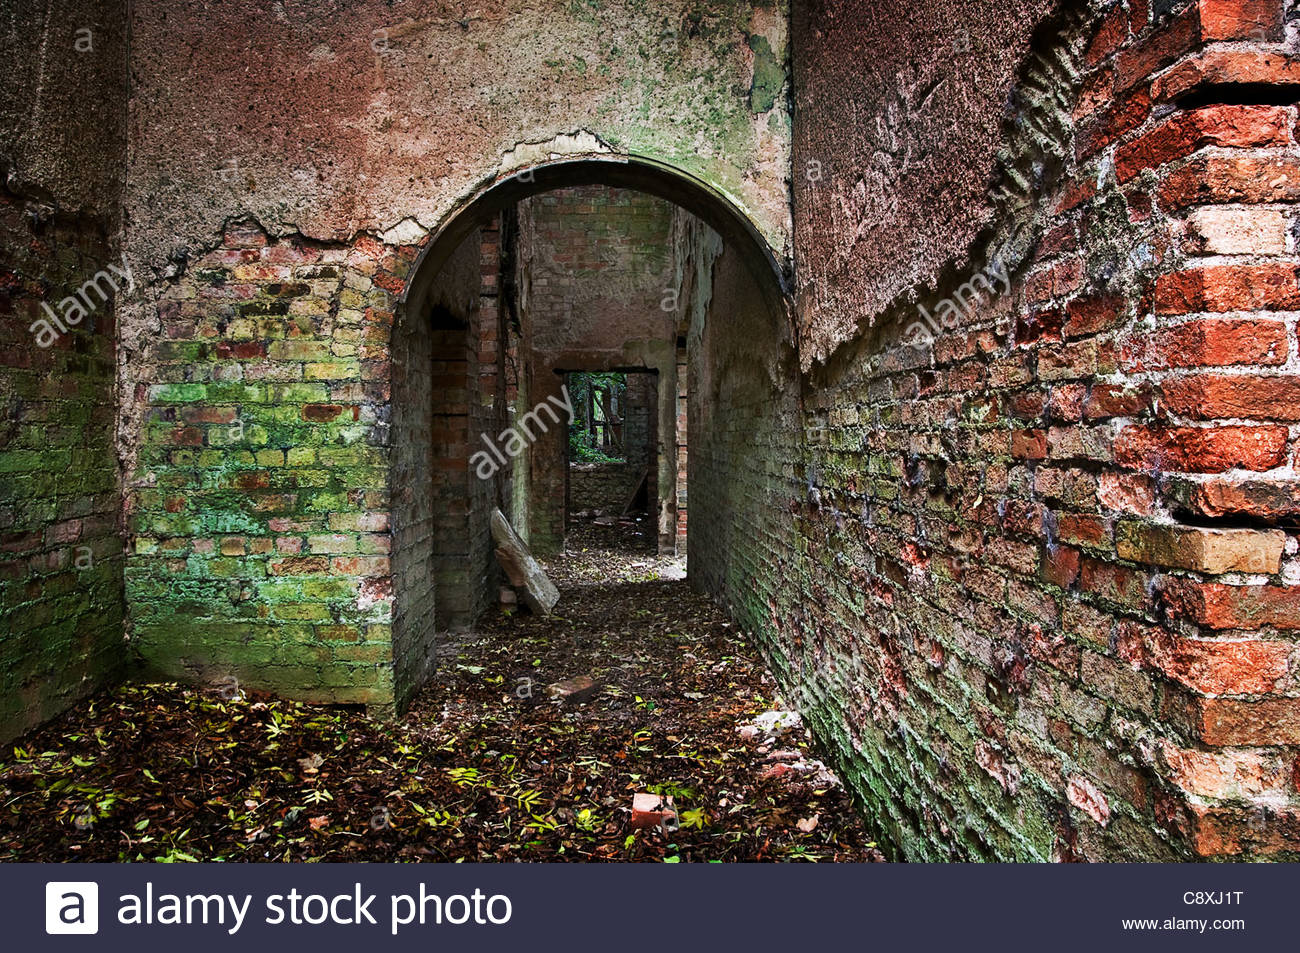 Derelict brick ruin - Stock Image